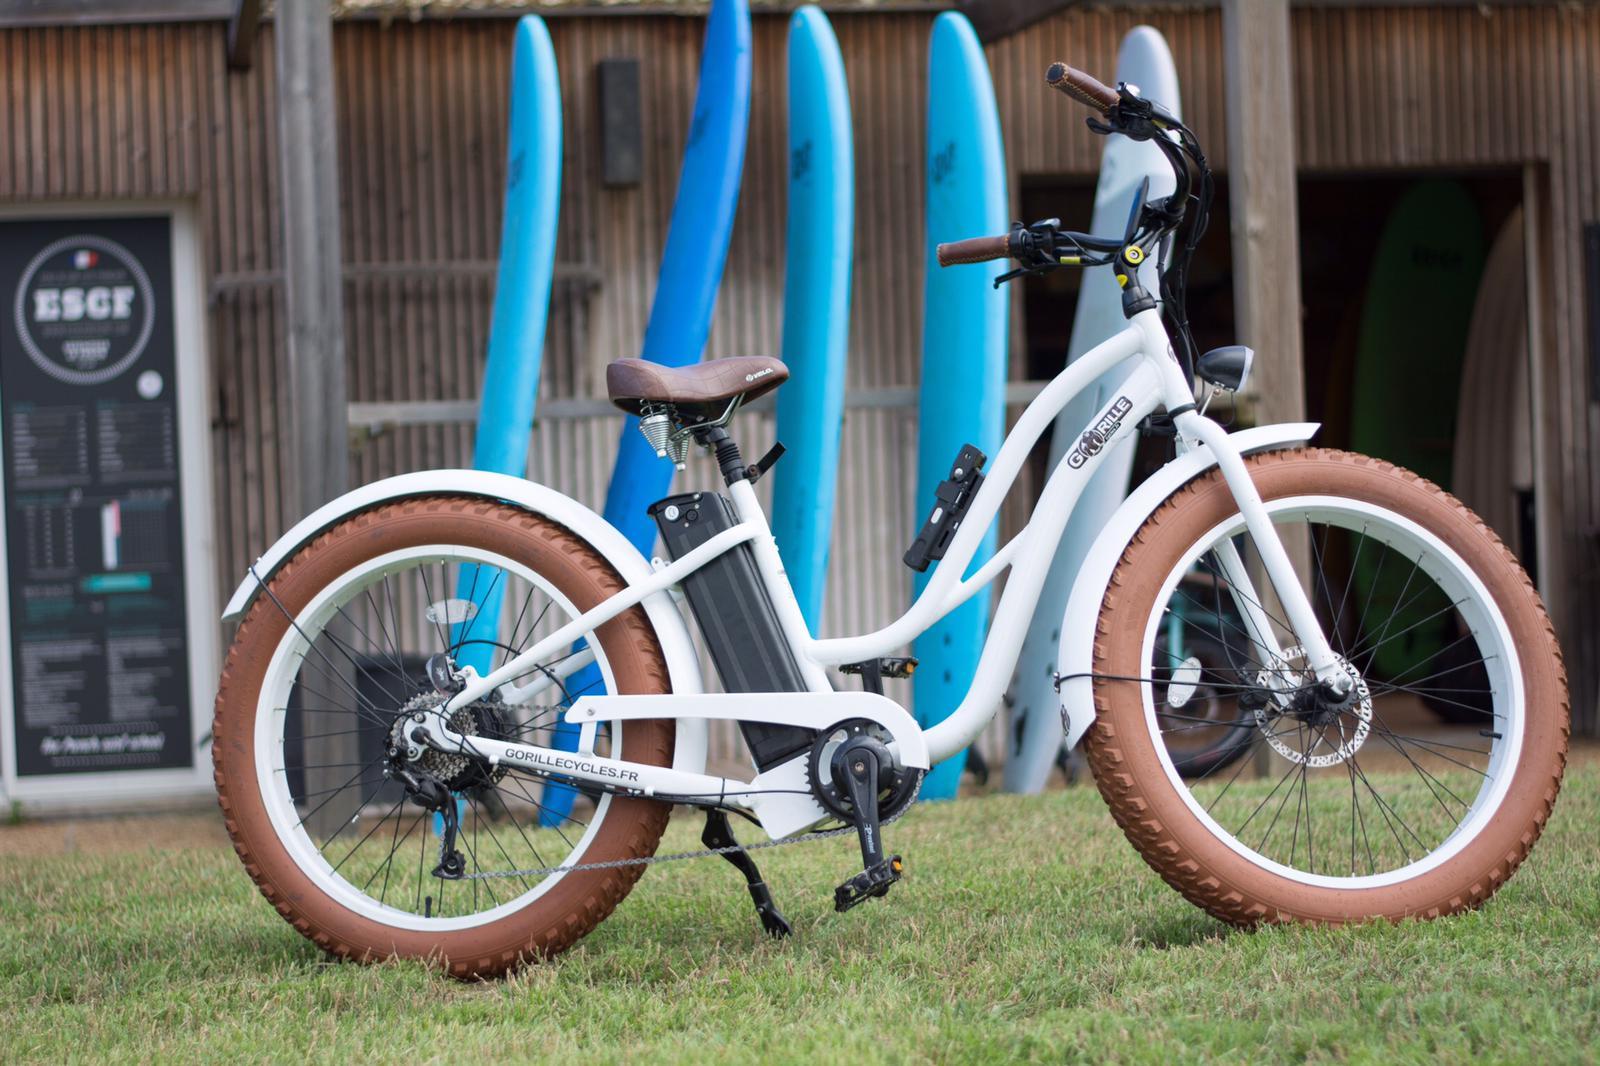 location fatbike seignosse beach bikes